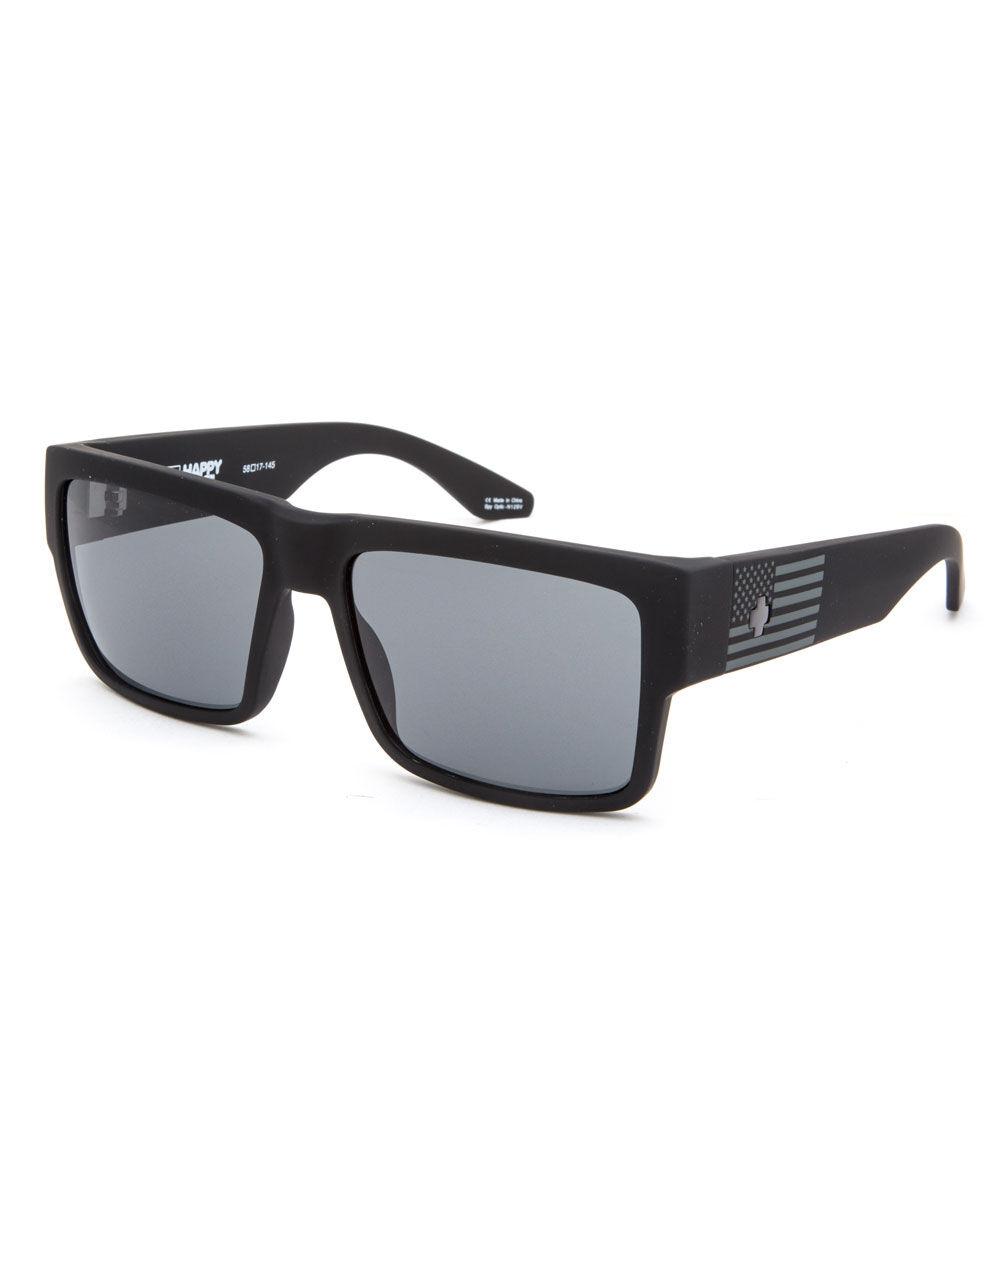 SPY Cyrus Matte Black Flag Sunglasses